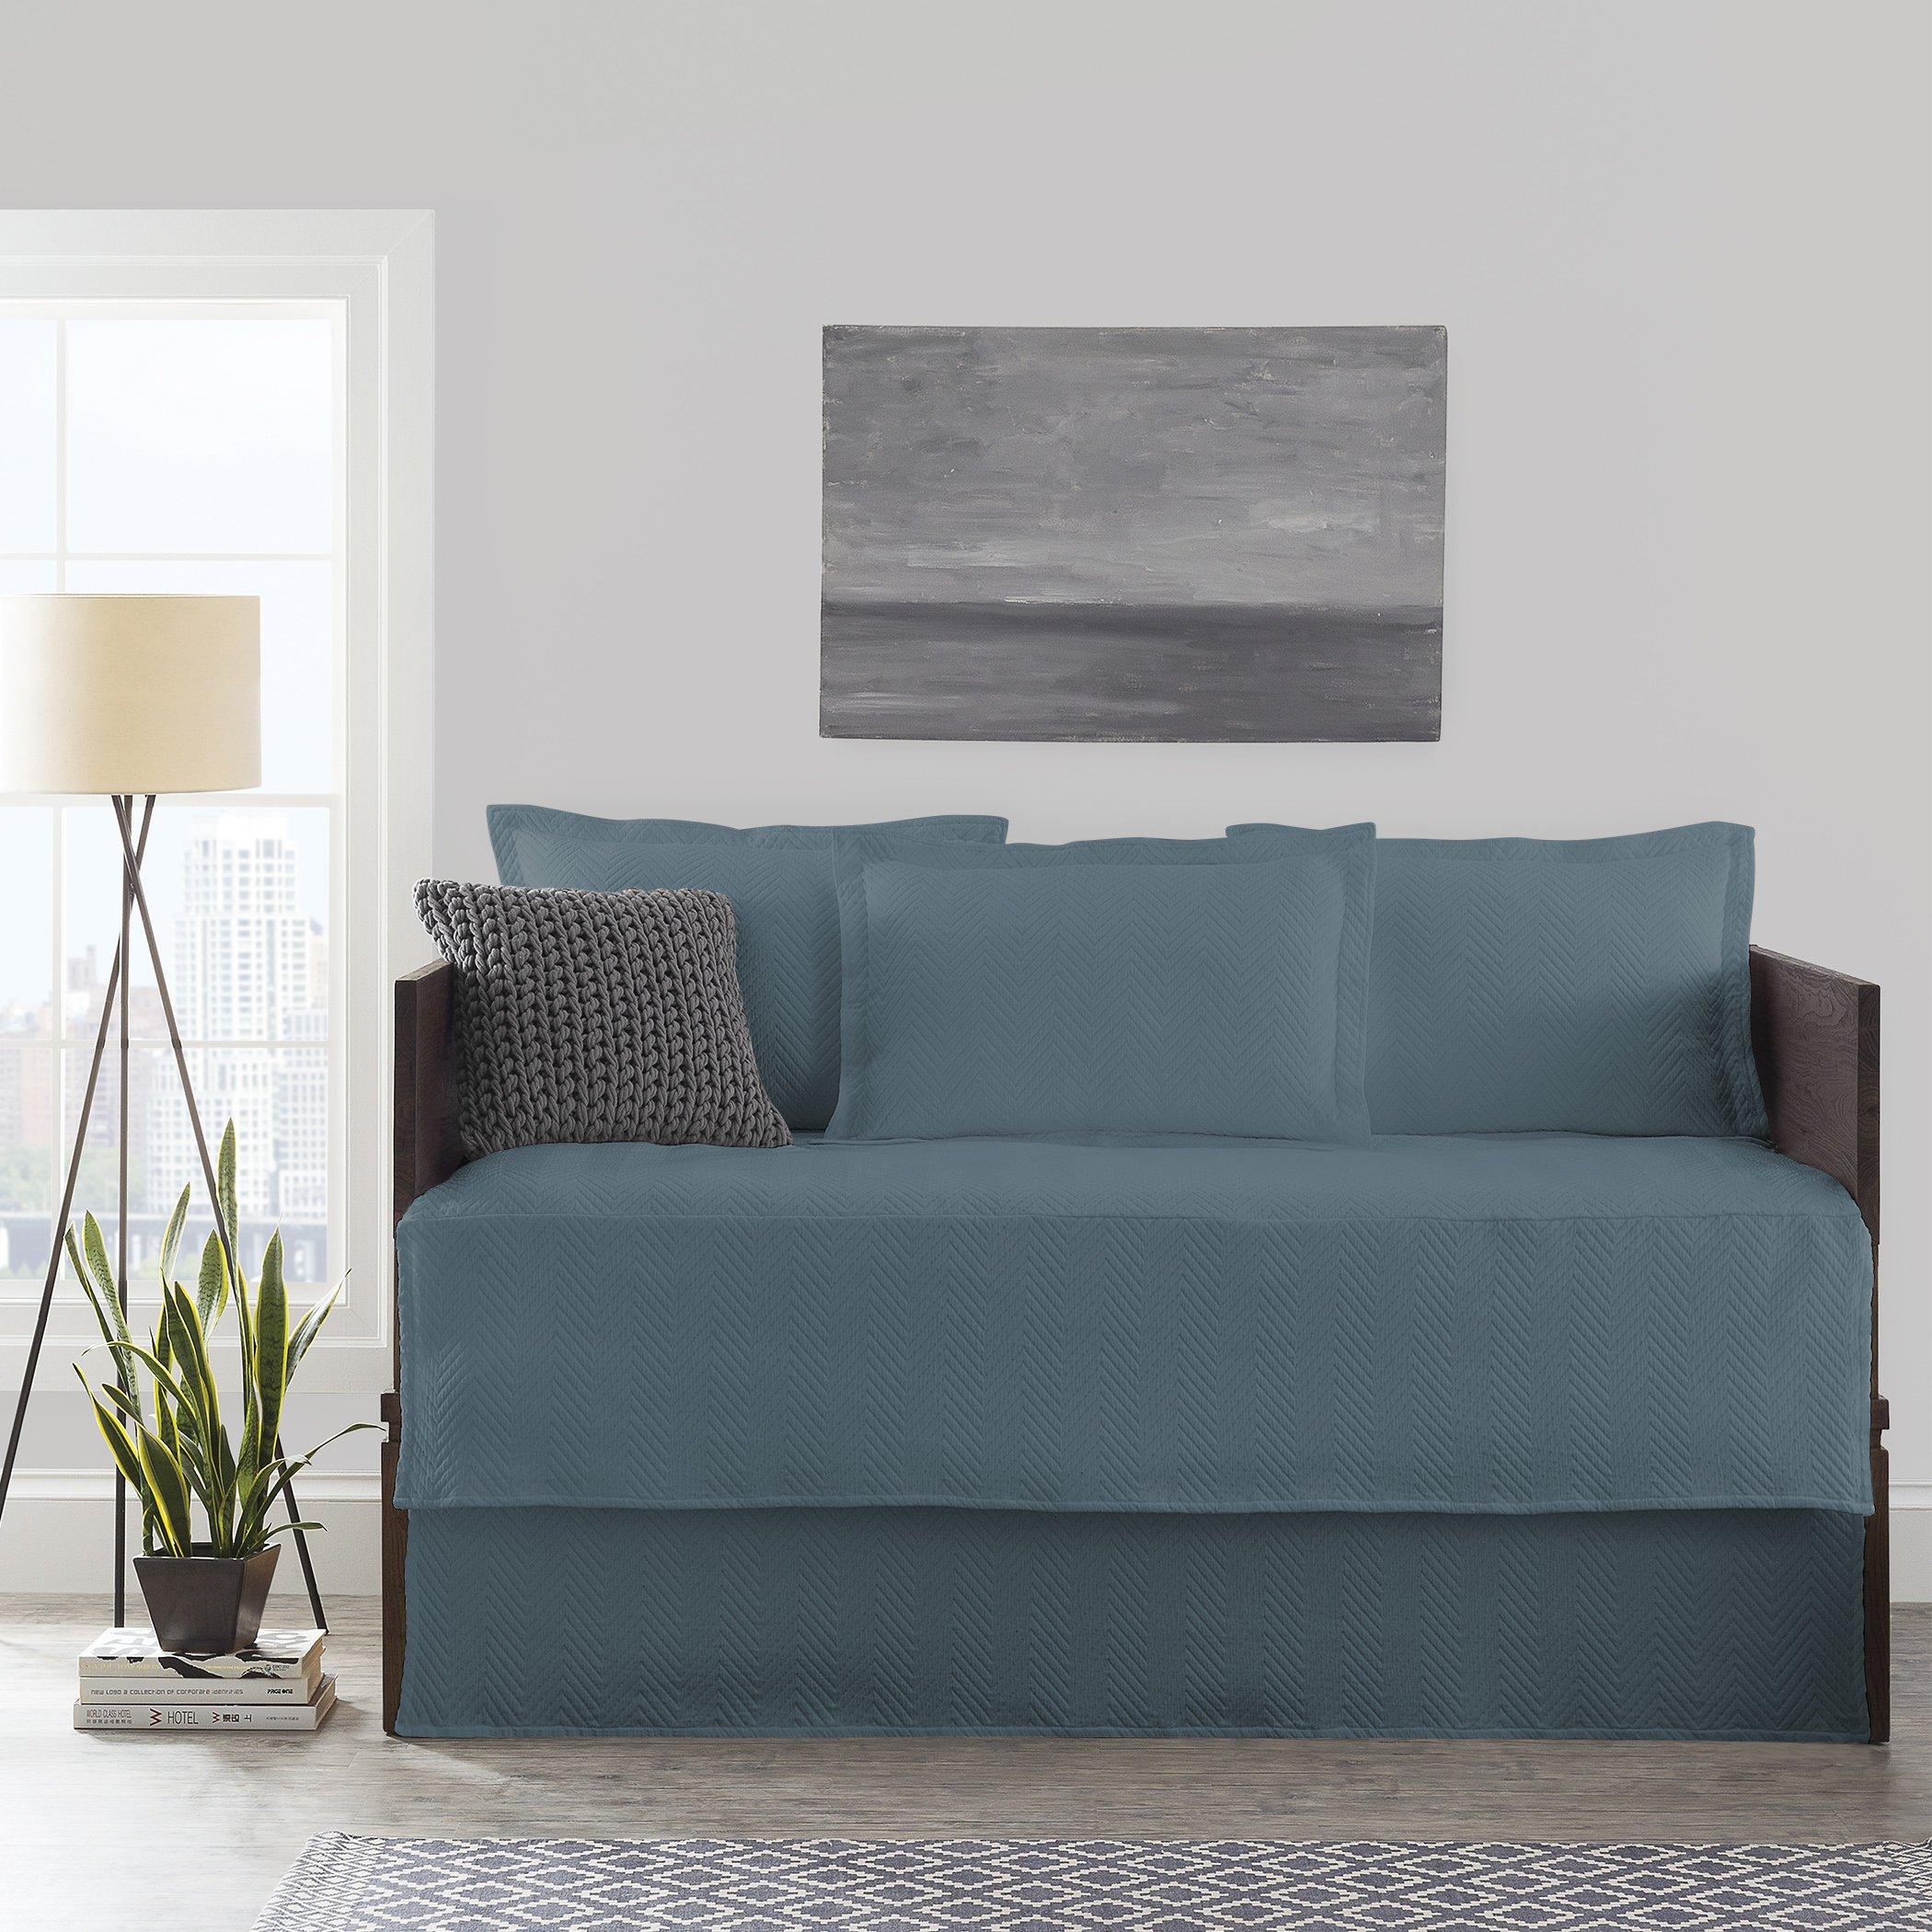 LaMont Home LBCV76990139 Chevron Day Bed Set Tapestry Blue,